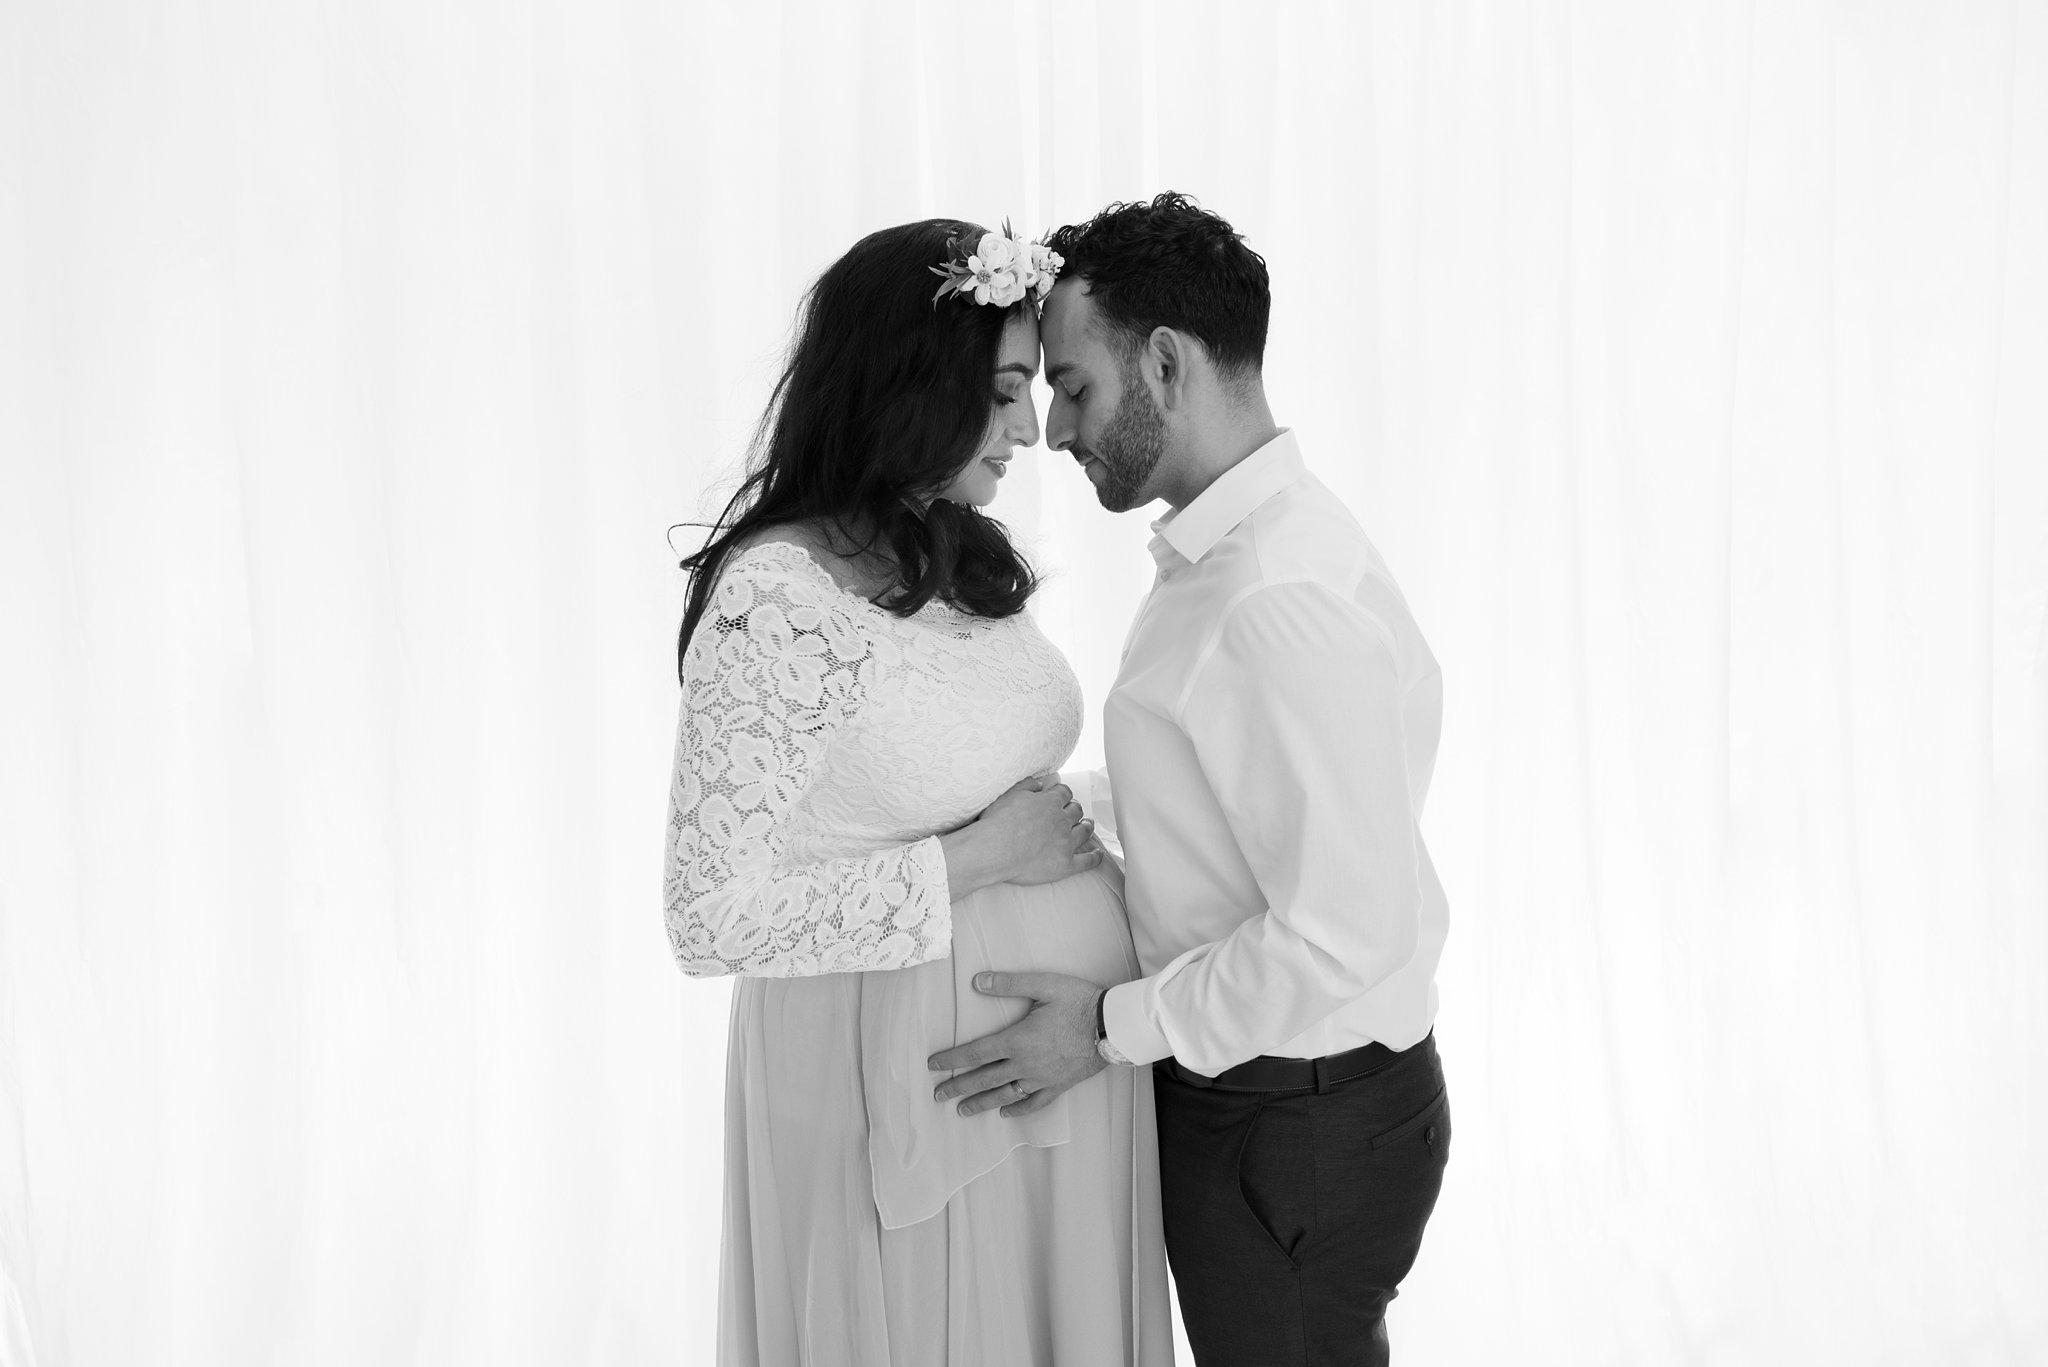 columbusohio-maternityphotography-jacquelinemariephotography_0009.jpg